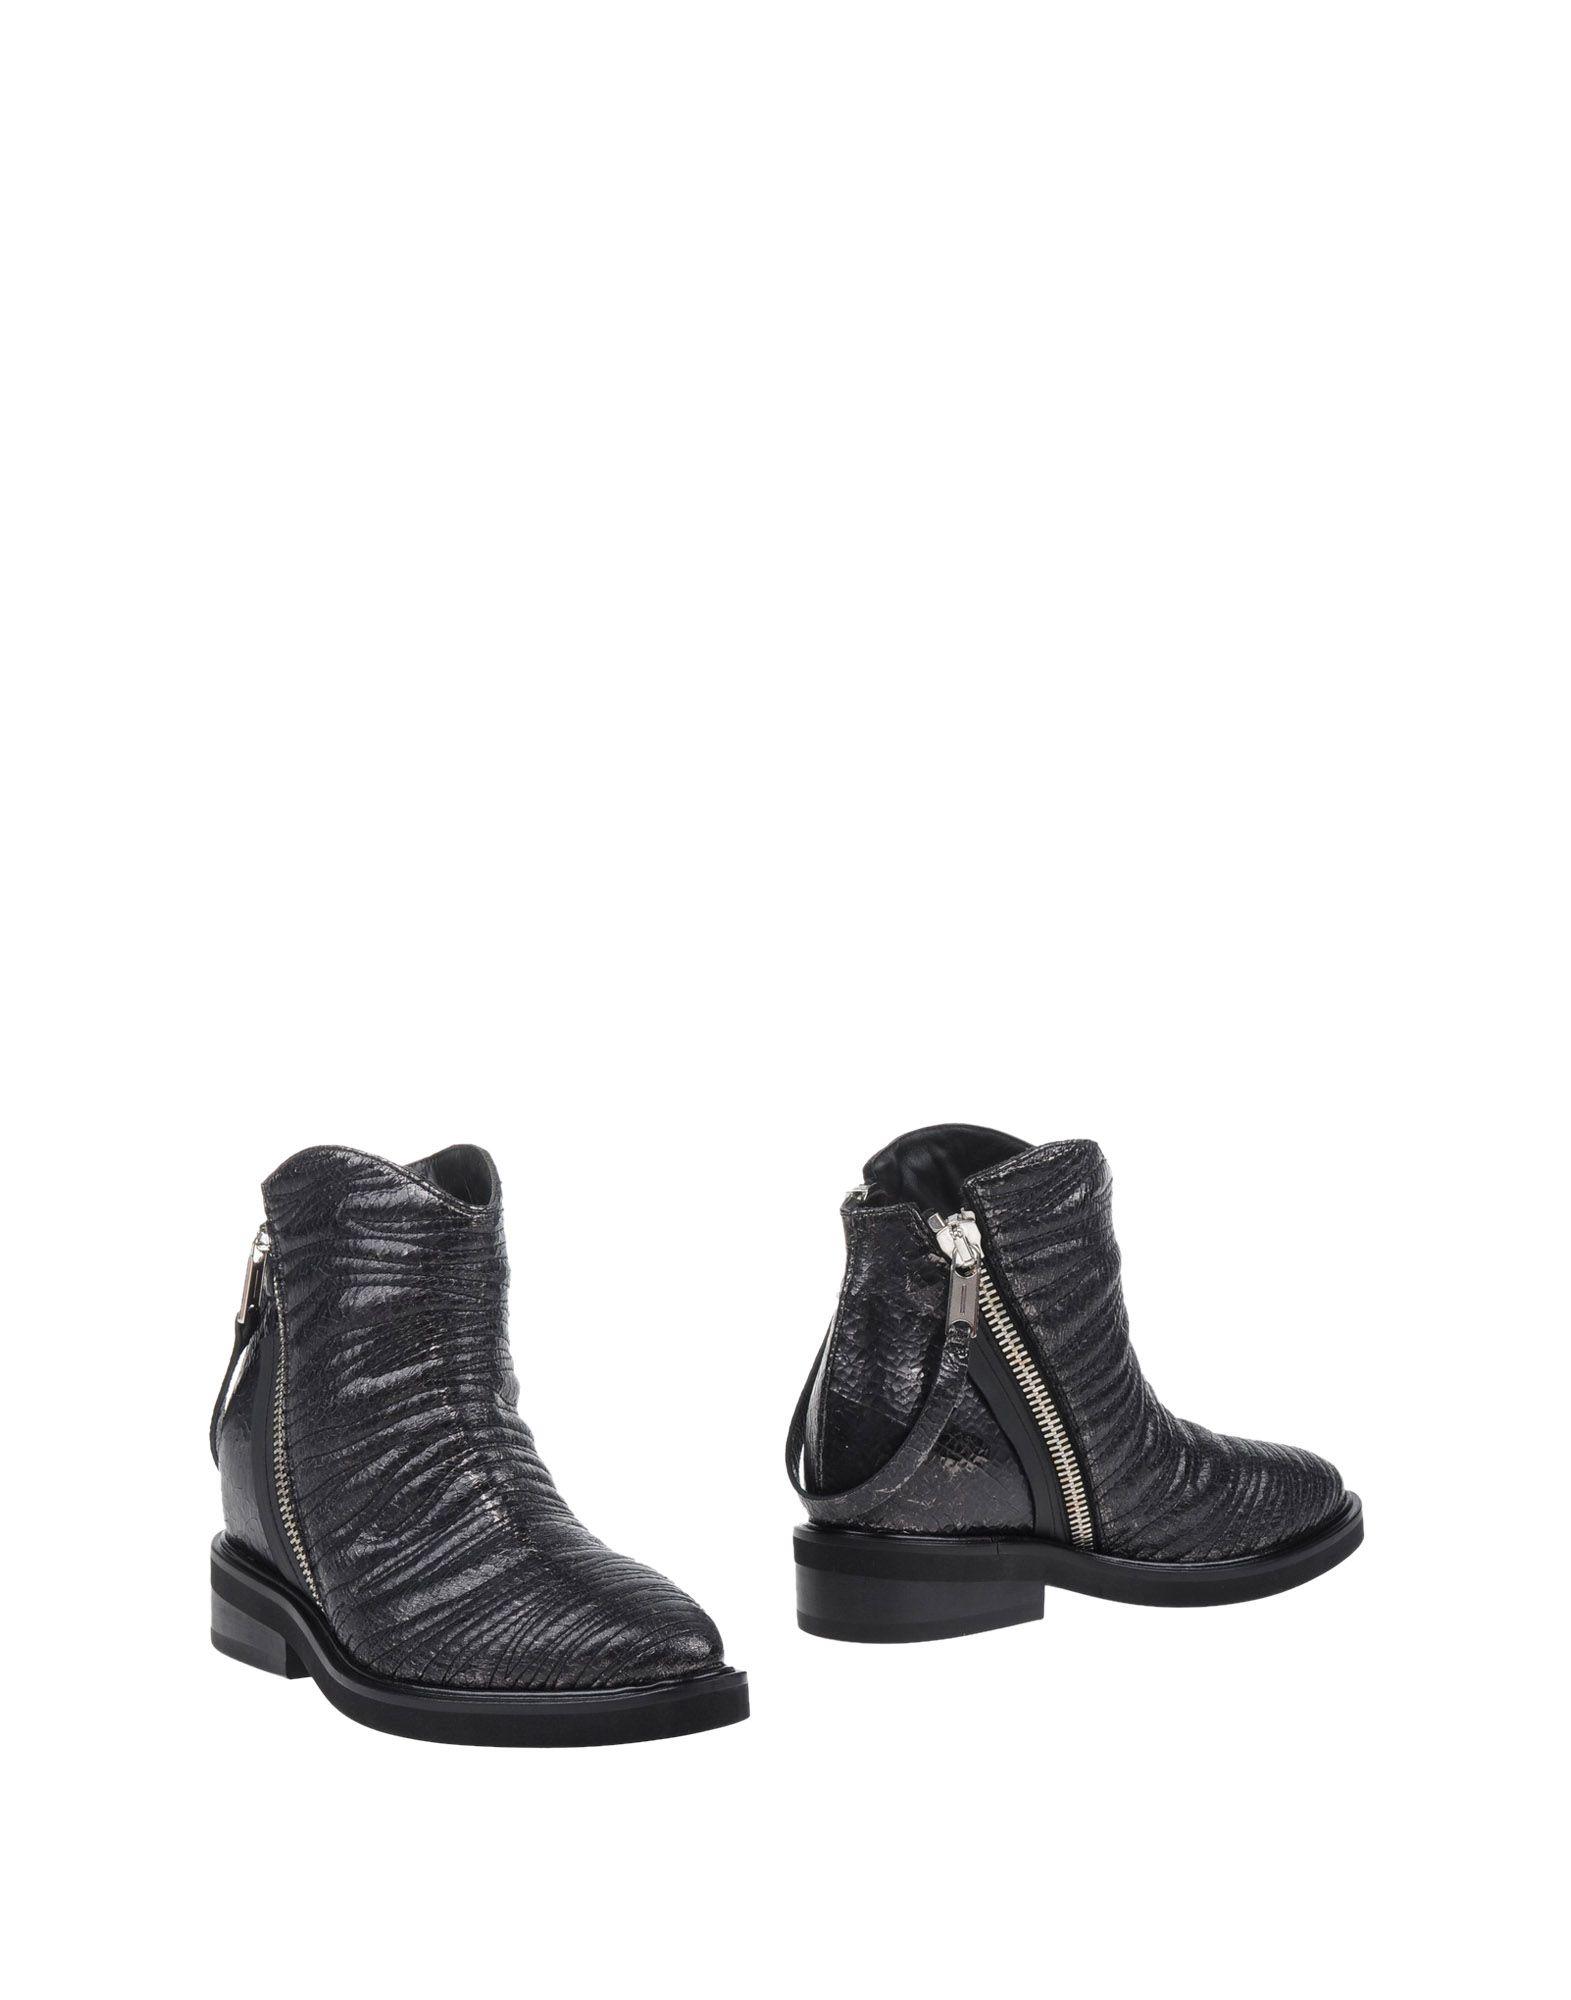 CINZIA ARAIA Полусапоги и высокие ботинки cinzia araia полусапоги и высокие ботинки